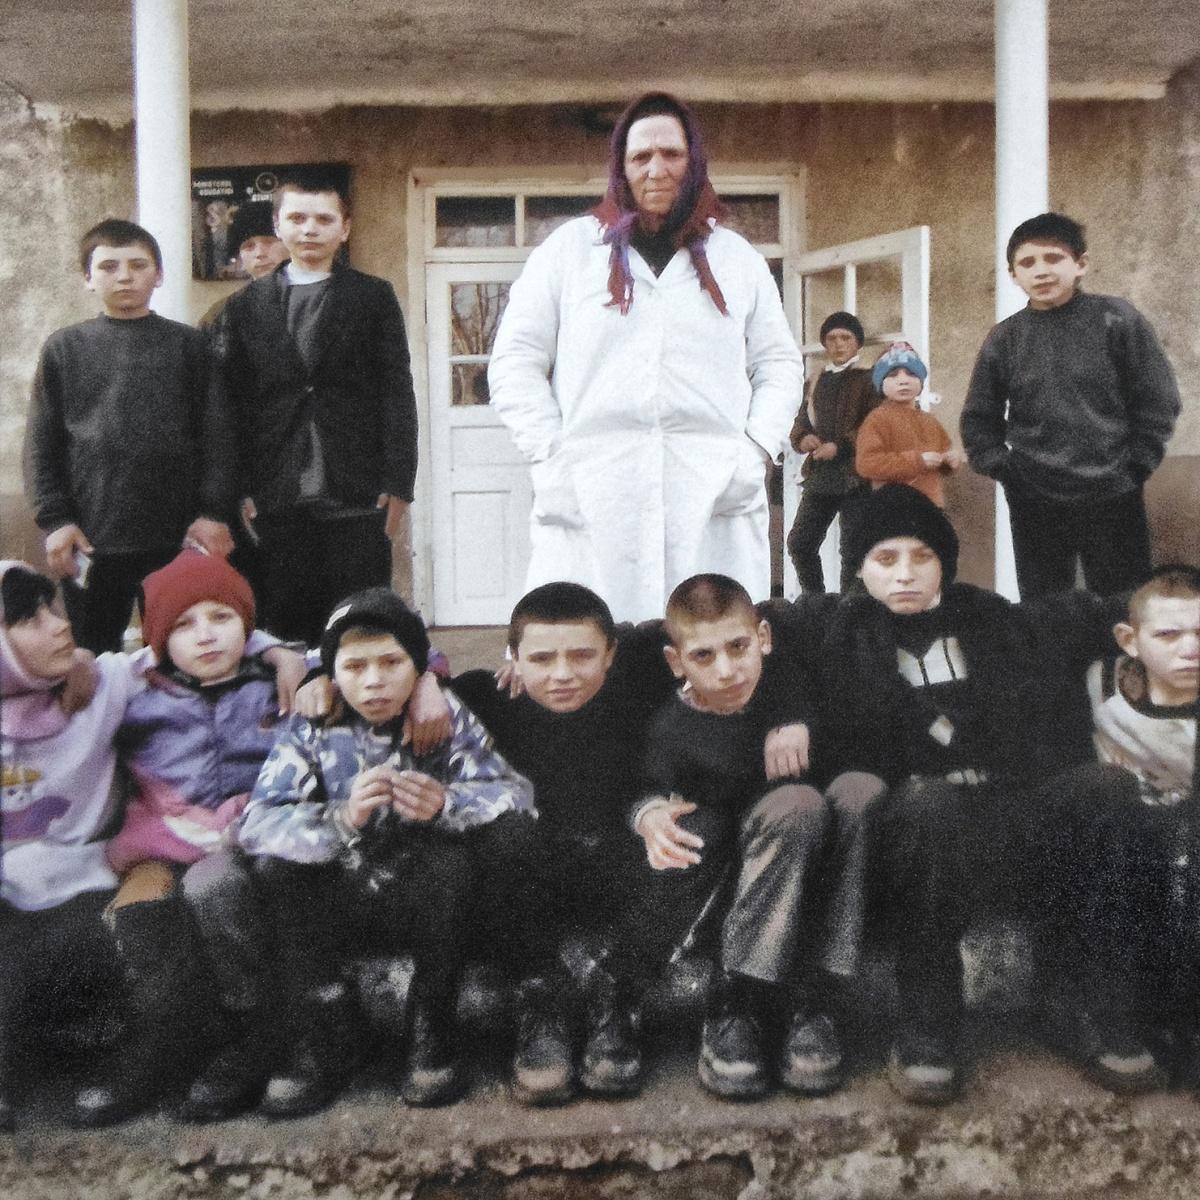 Chisinau - orfanotrofio Chisinau - orphanage